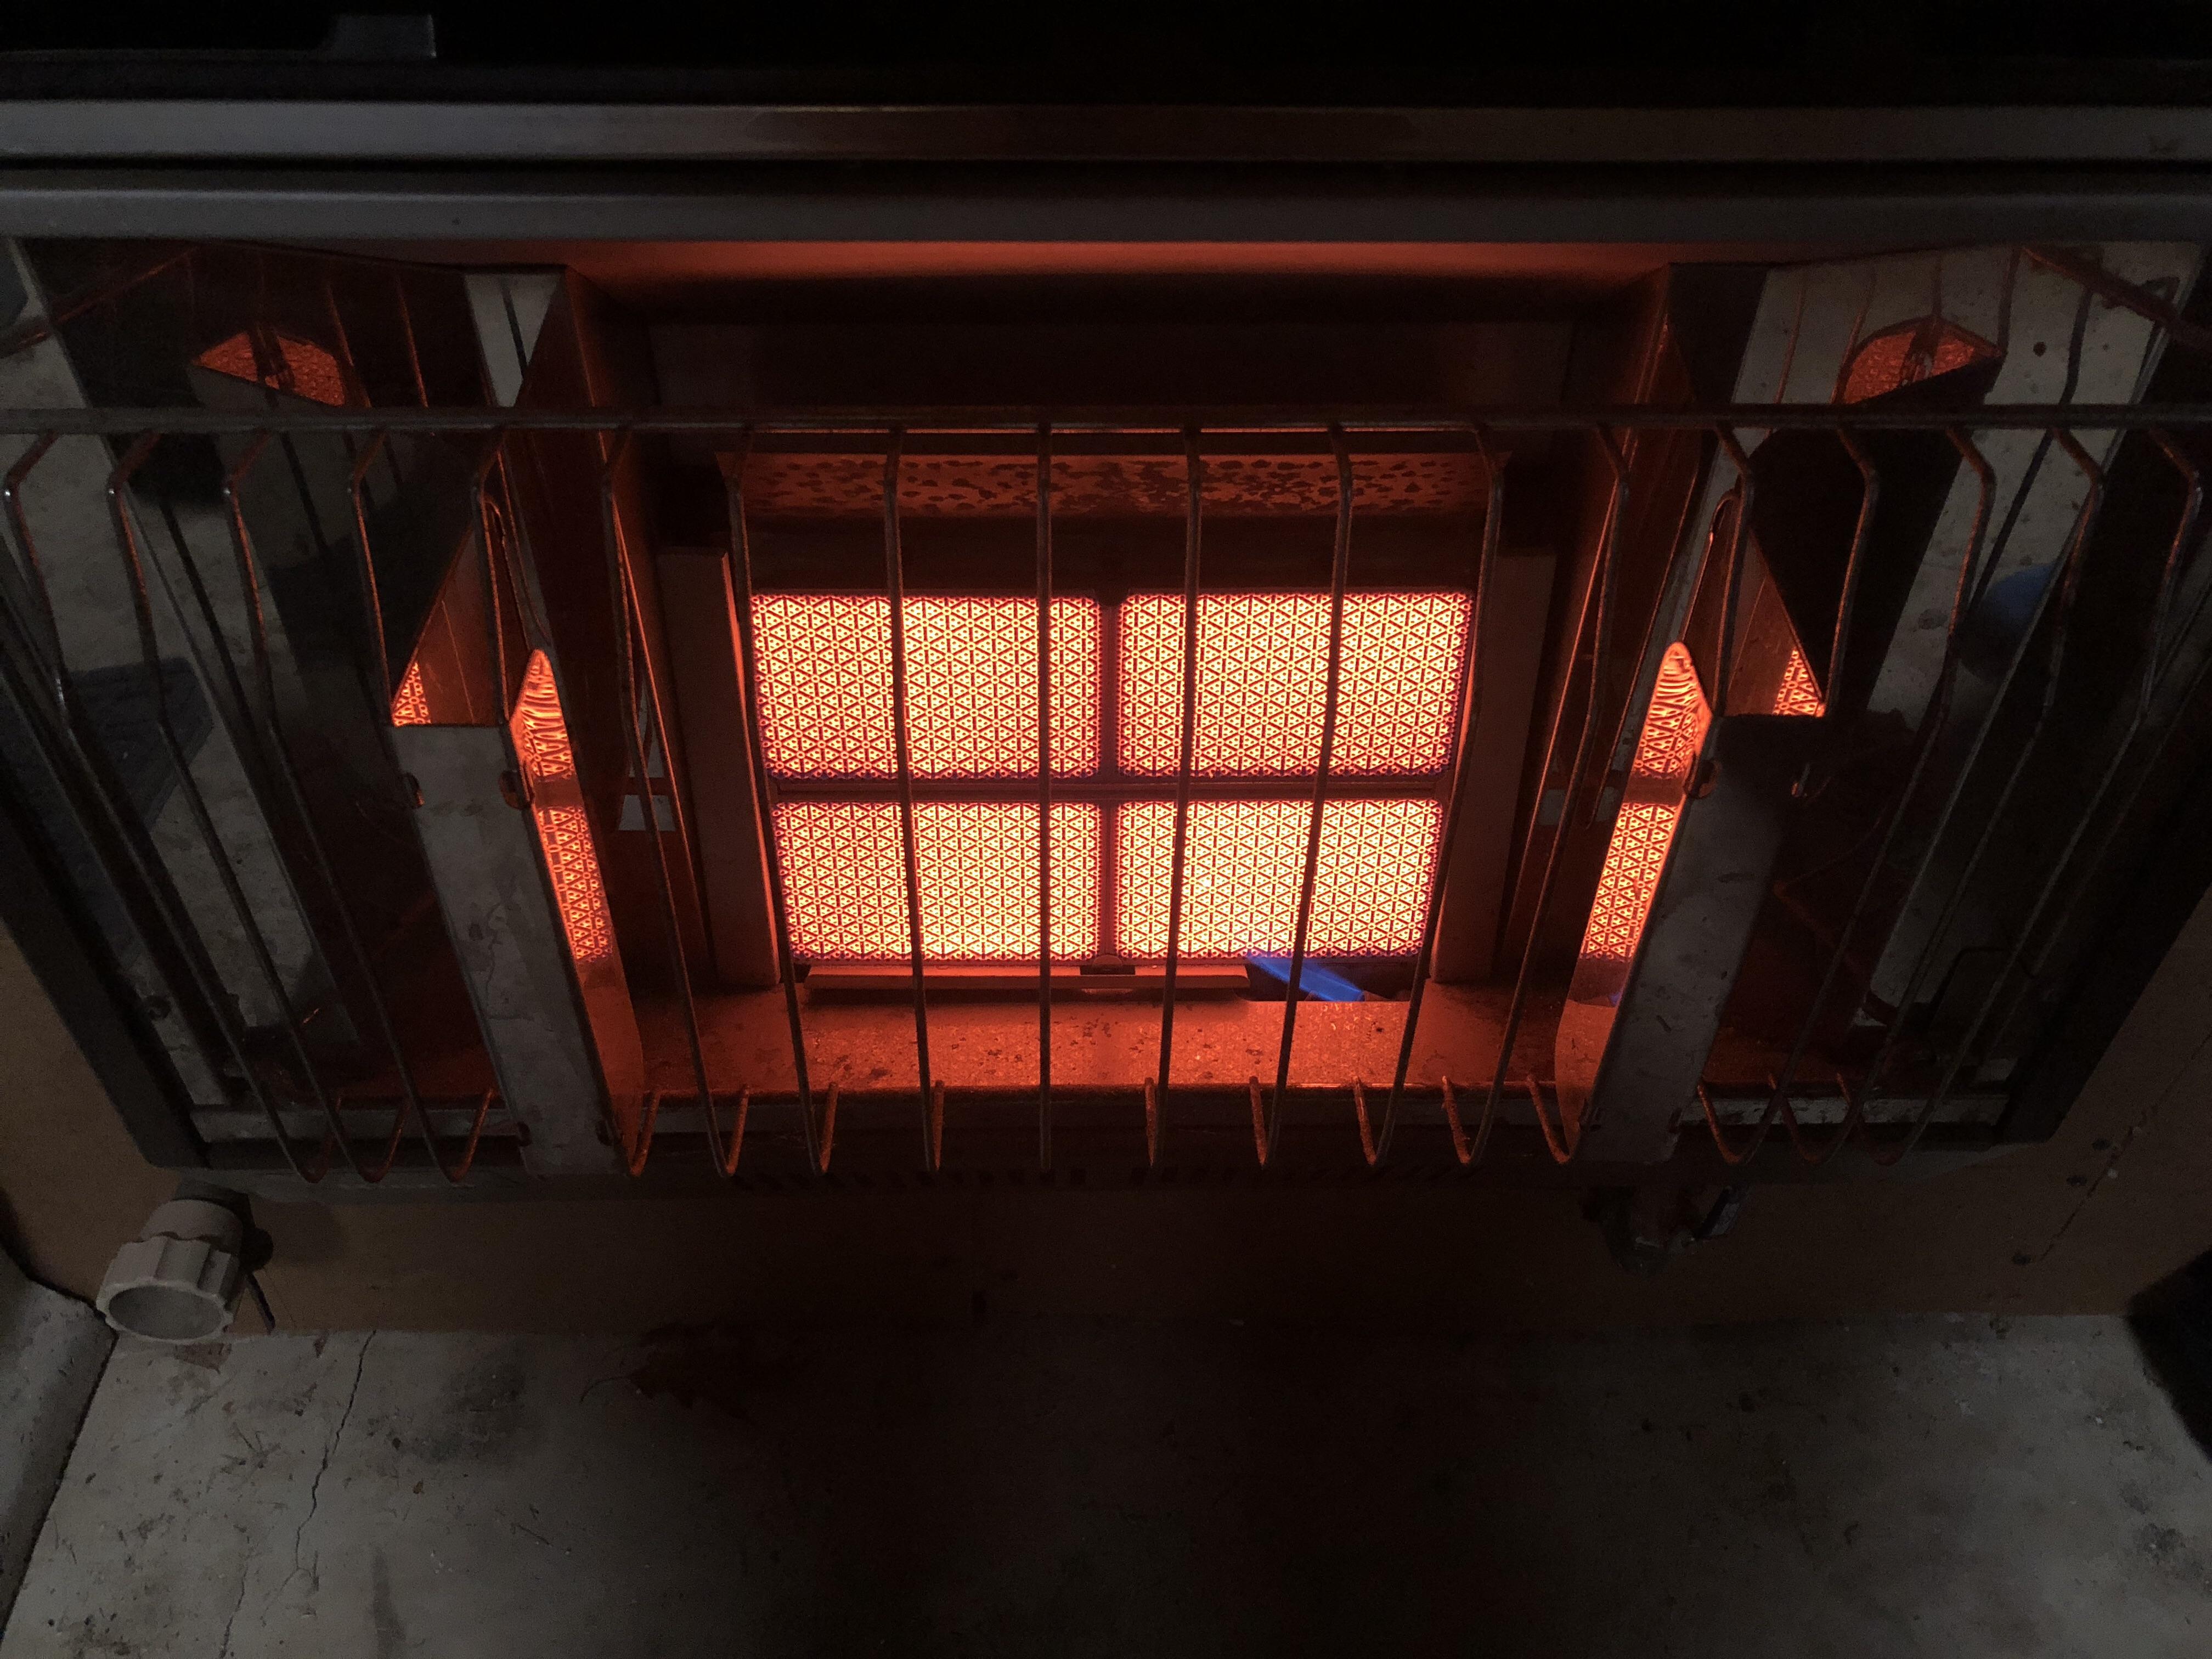 heater-back-in-action.jpg